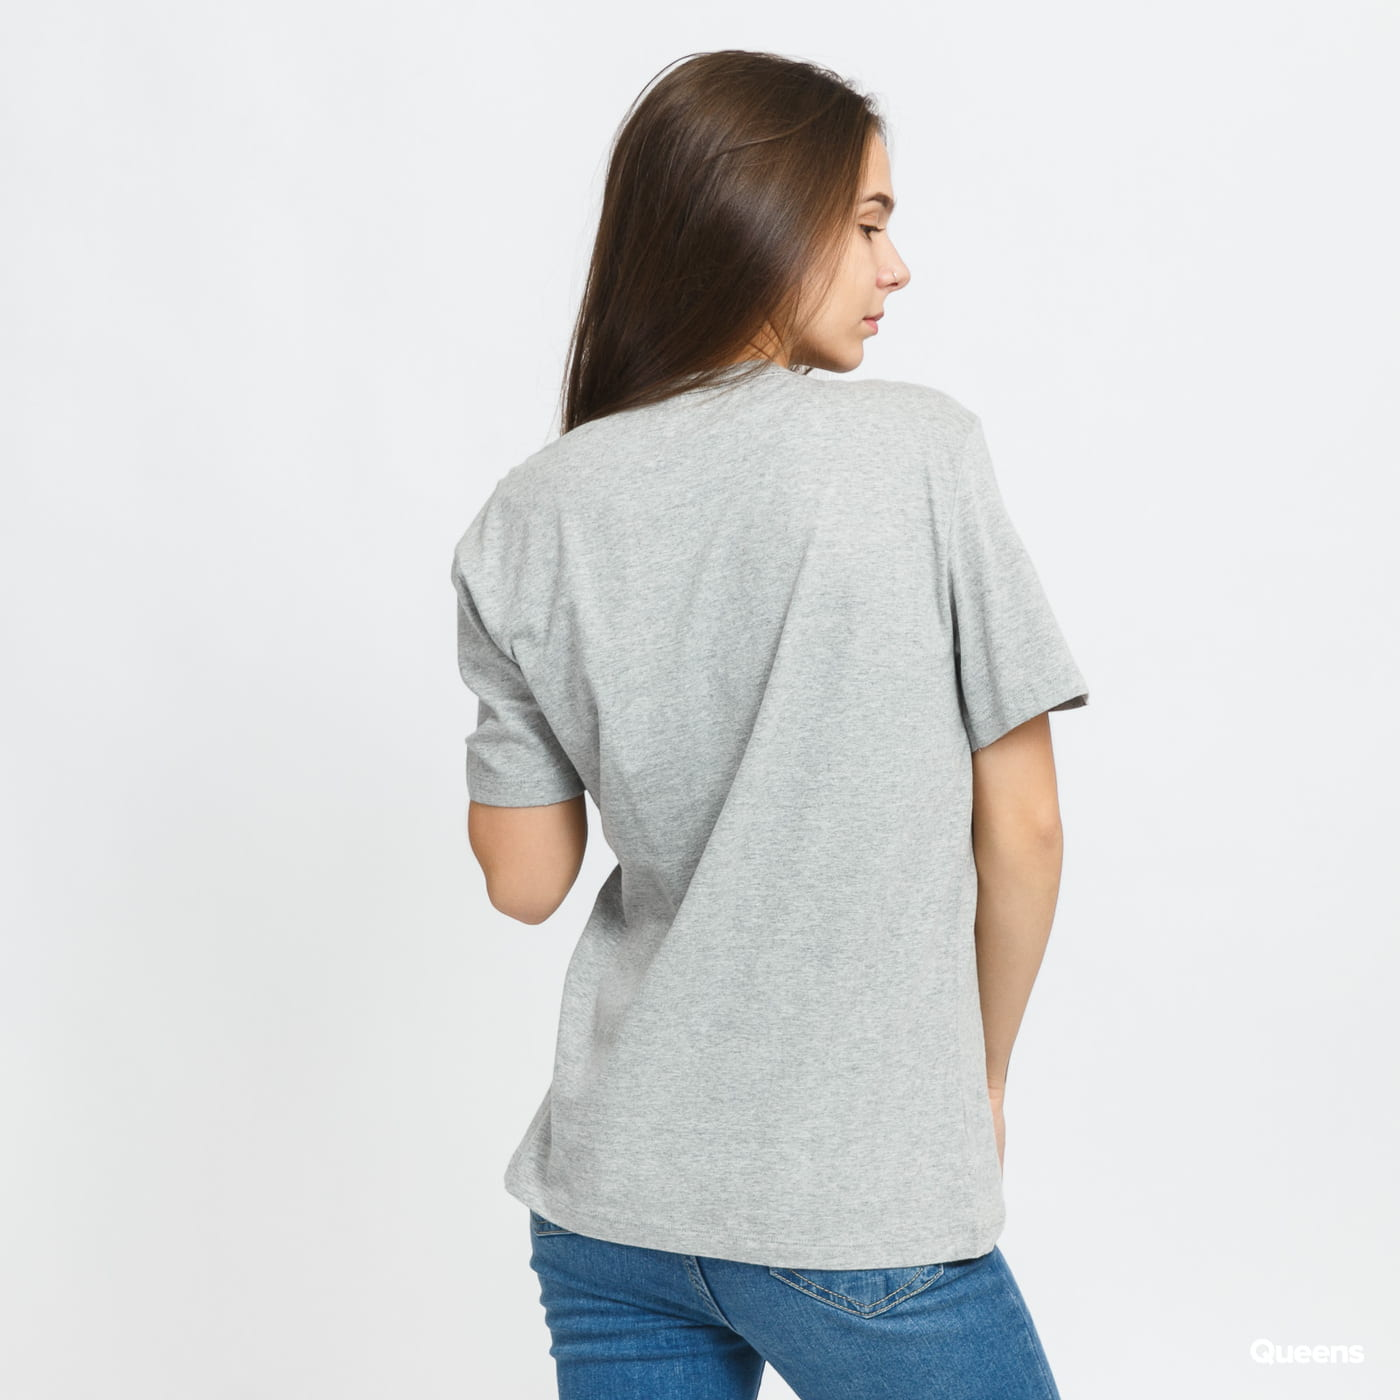 Calvin Klein SS Crew Neck melange gray